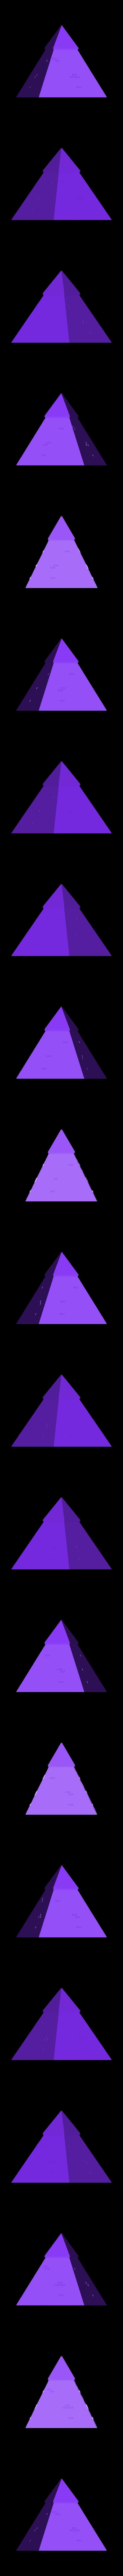 CHAHIN_PYRAMID.obj Download free OBJ file Pyramid • 3D printer design, Colorful3D